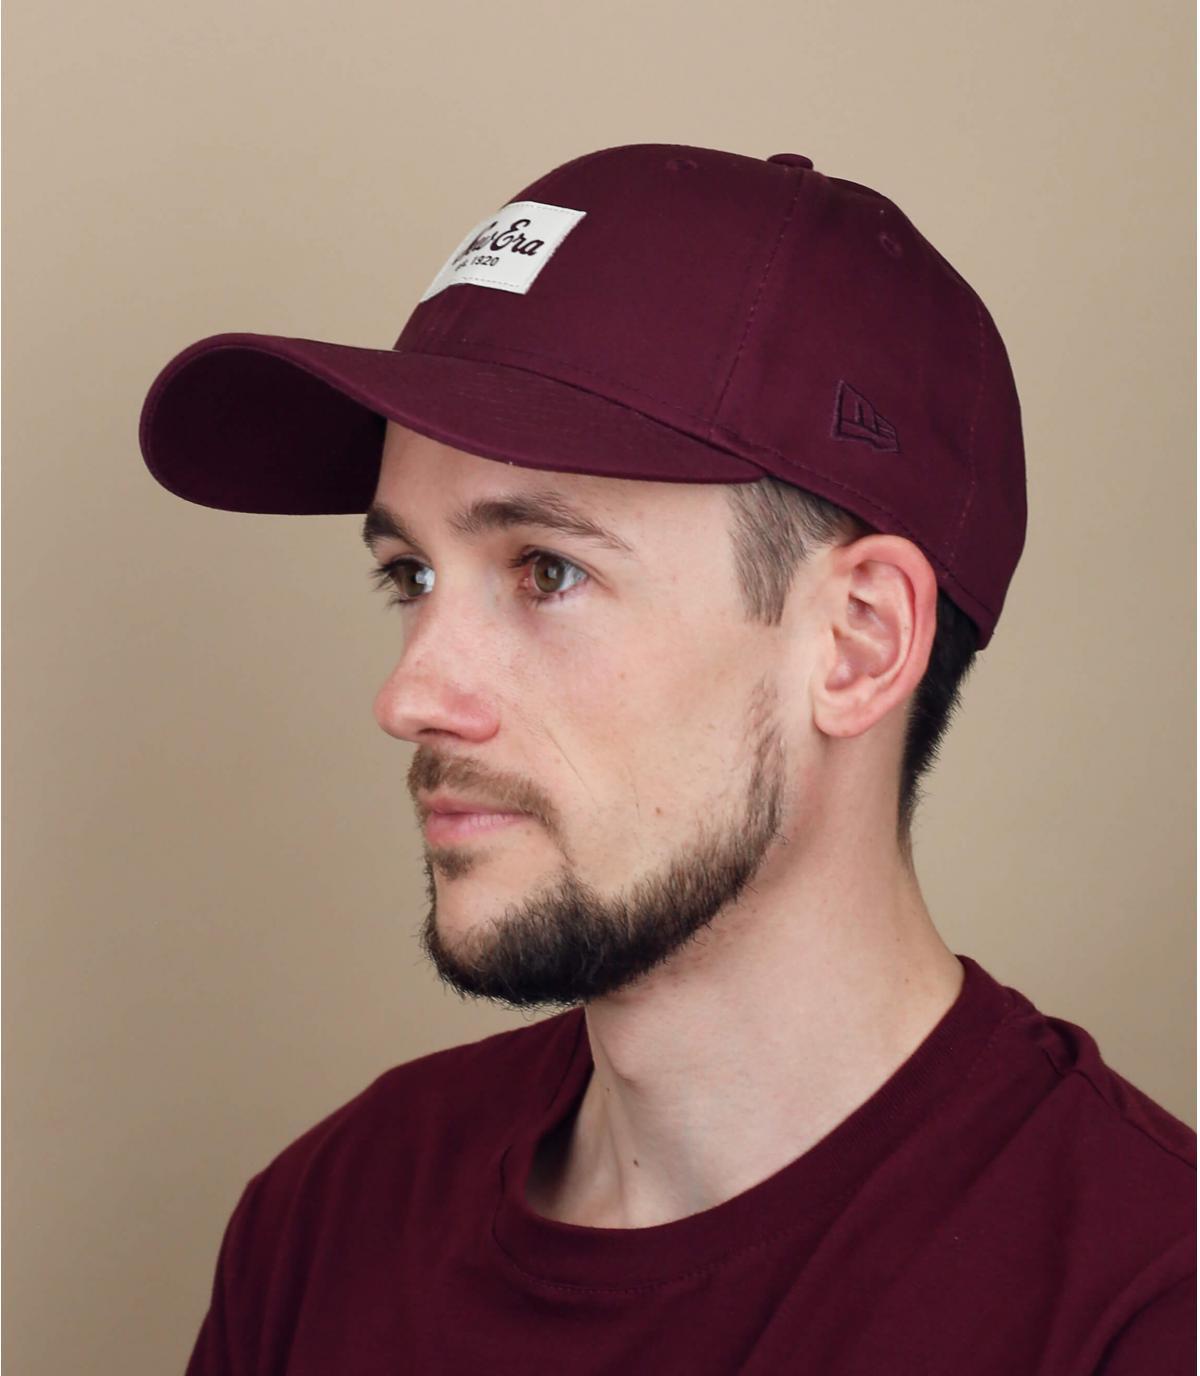 cappellino New Era bordeaux